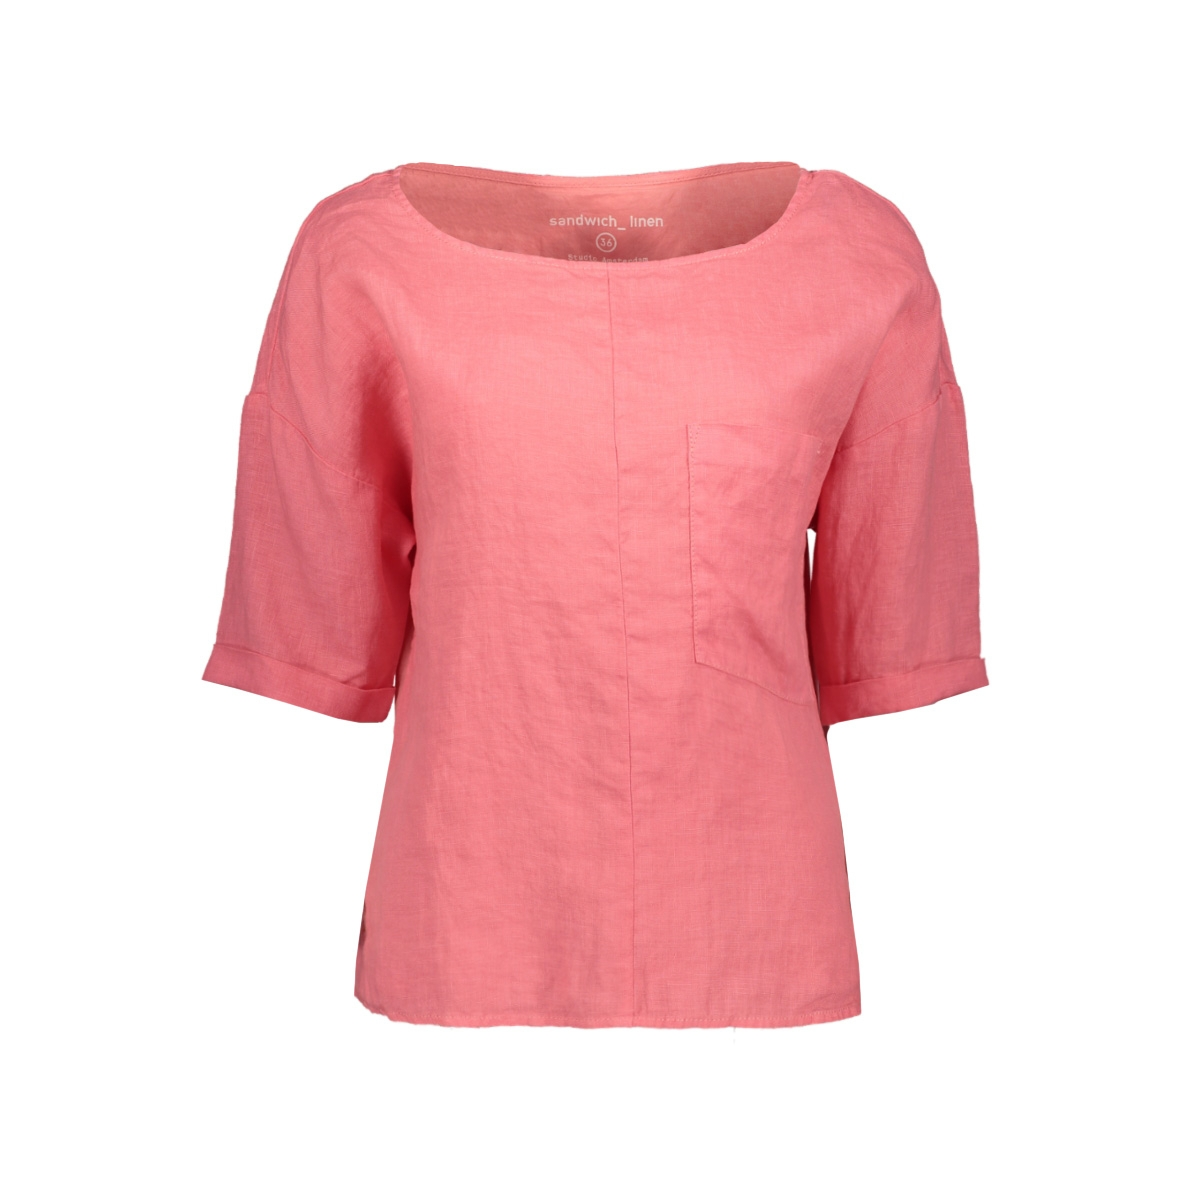 linnen blouse met borstzak 22001526 sandwich blouse 75078